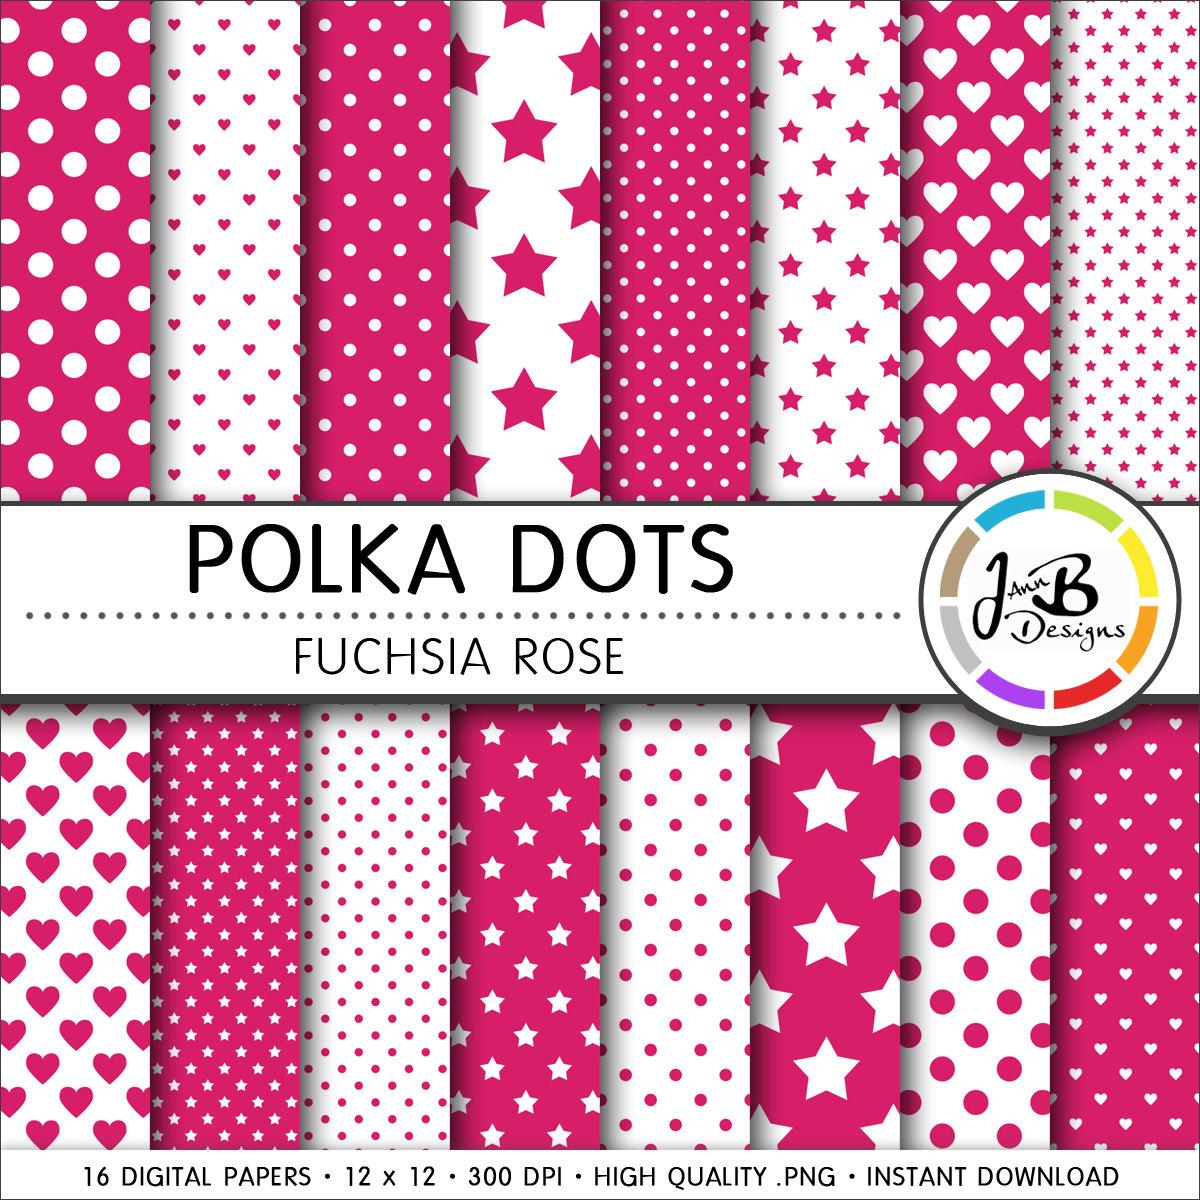 Papel Digital de lunares rosa fucsia rosa puntos